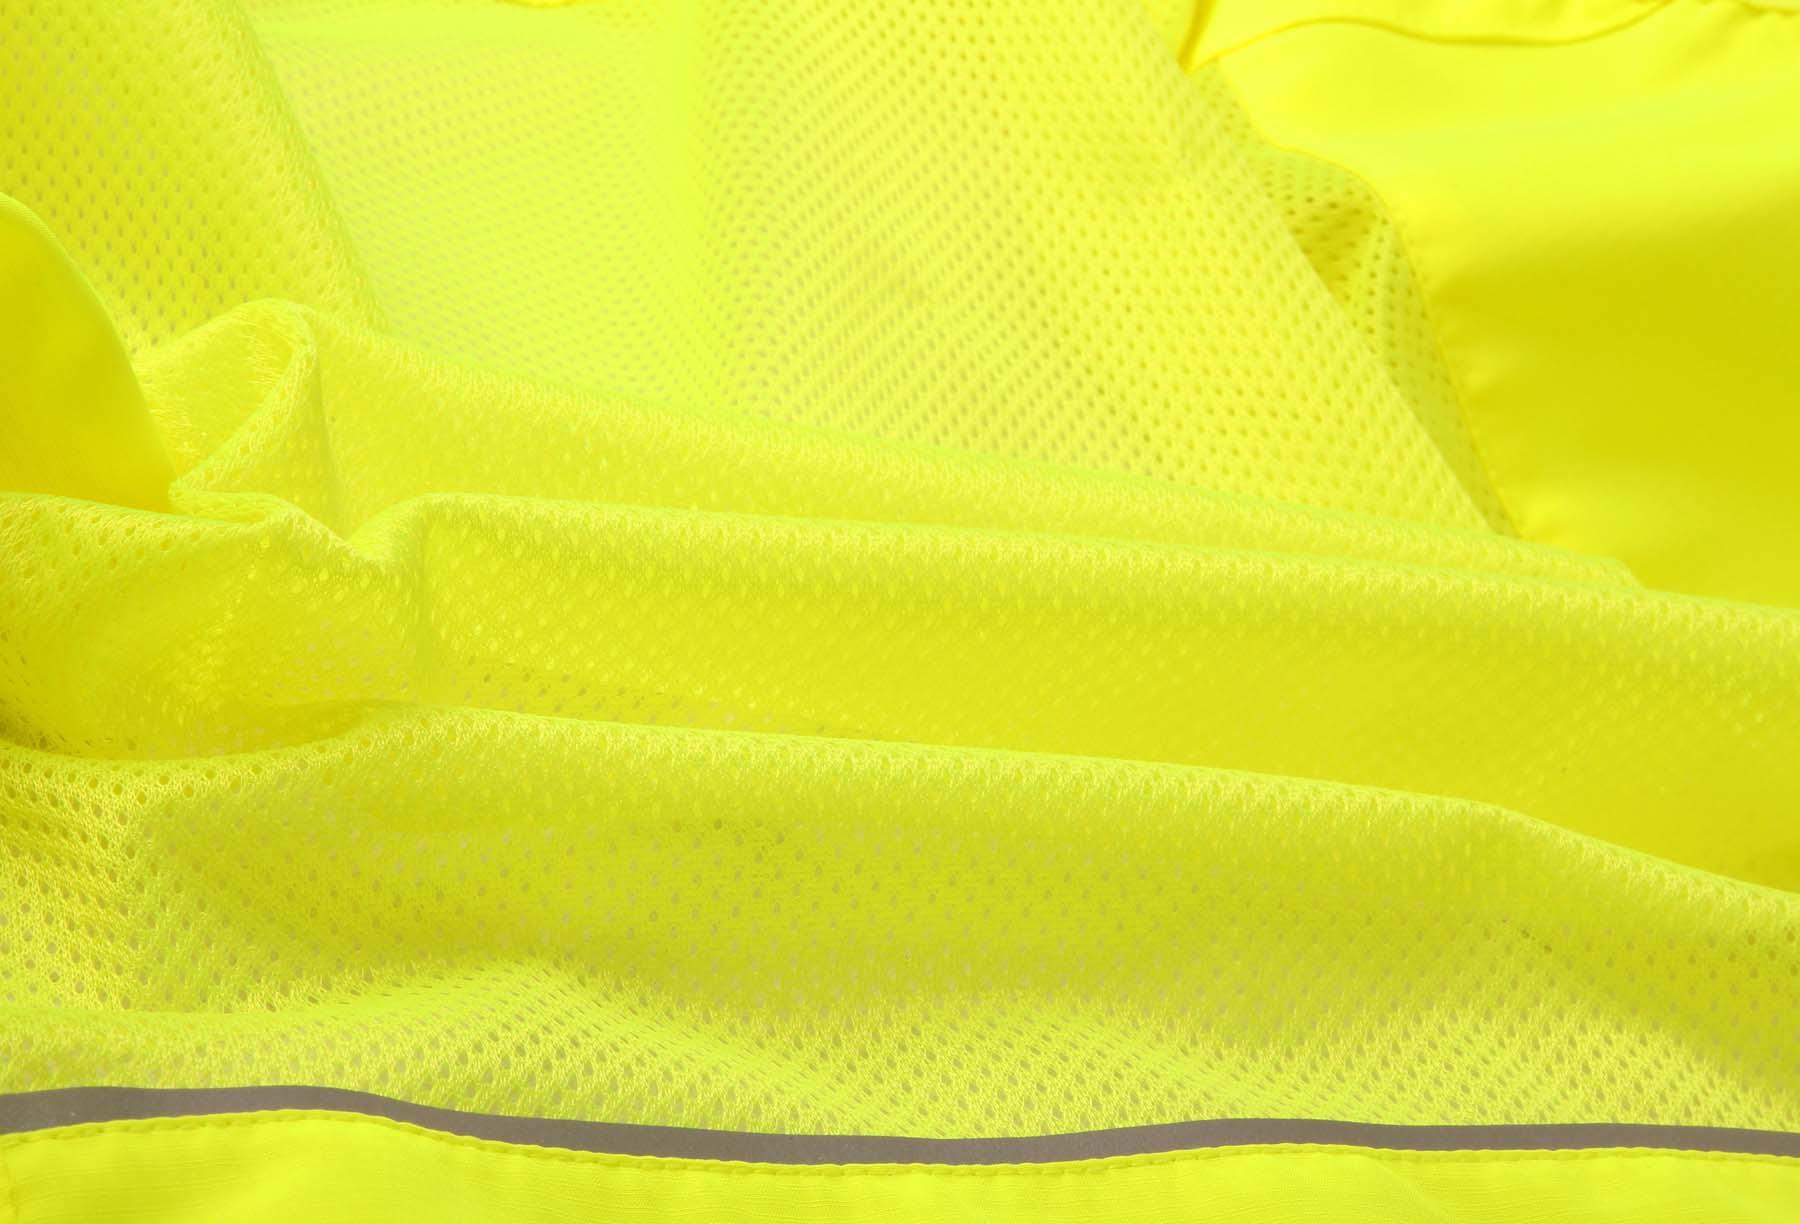 Venting mesh back panel